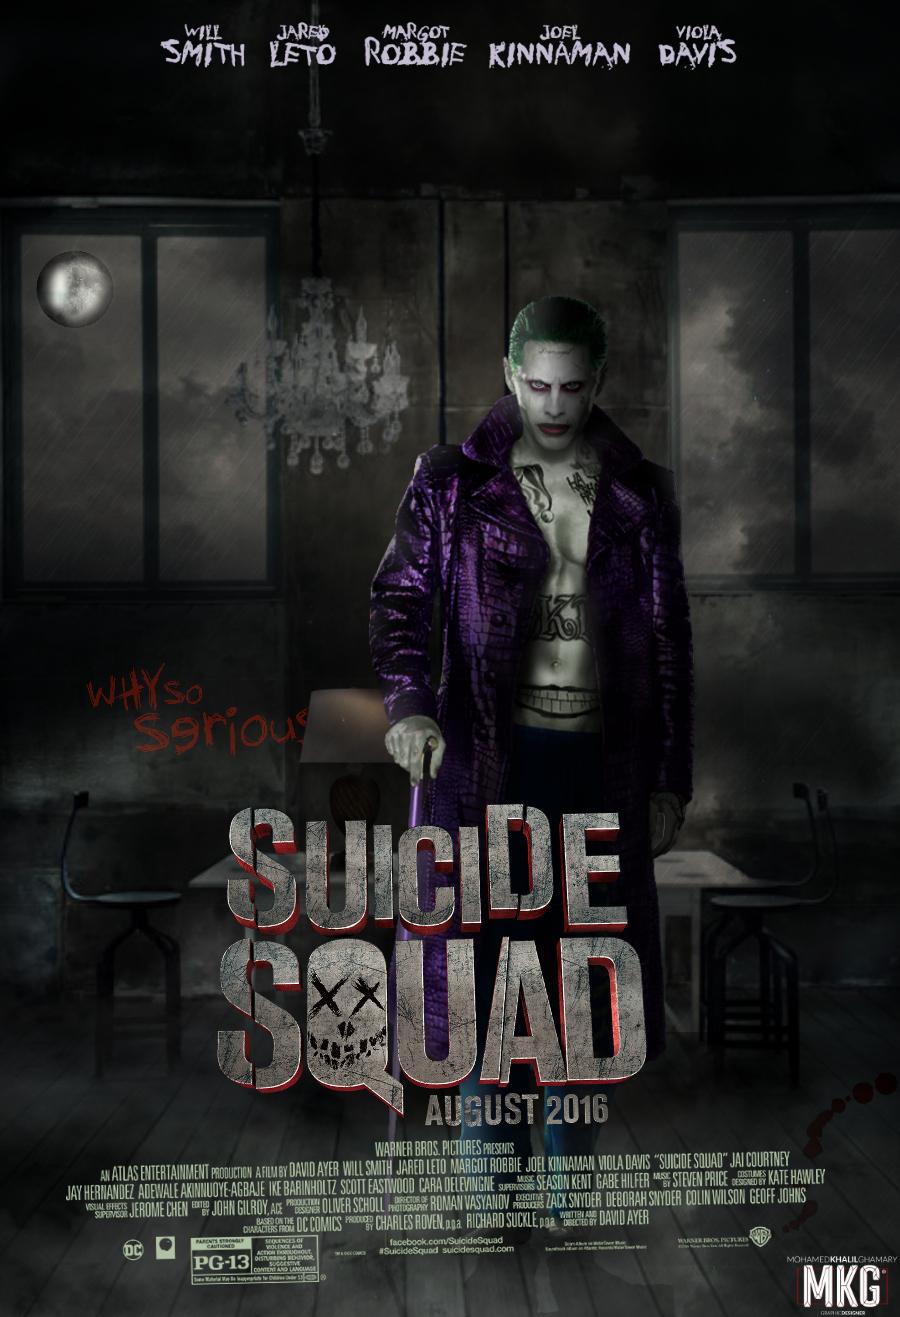 Suicide Squad - Movie Poster by KhalilGhamaryMKG on DeviantArt